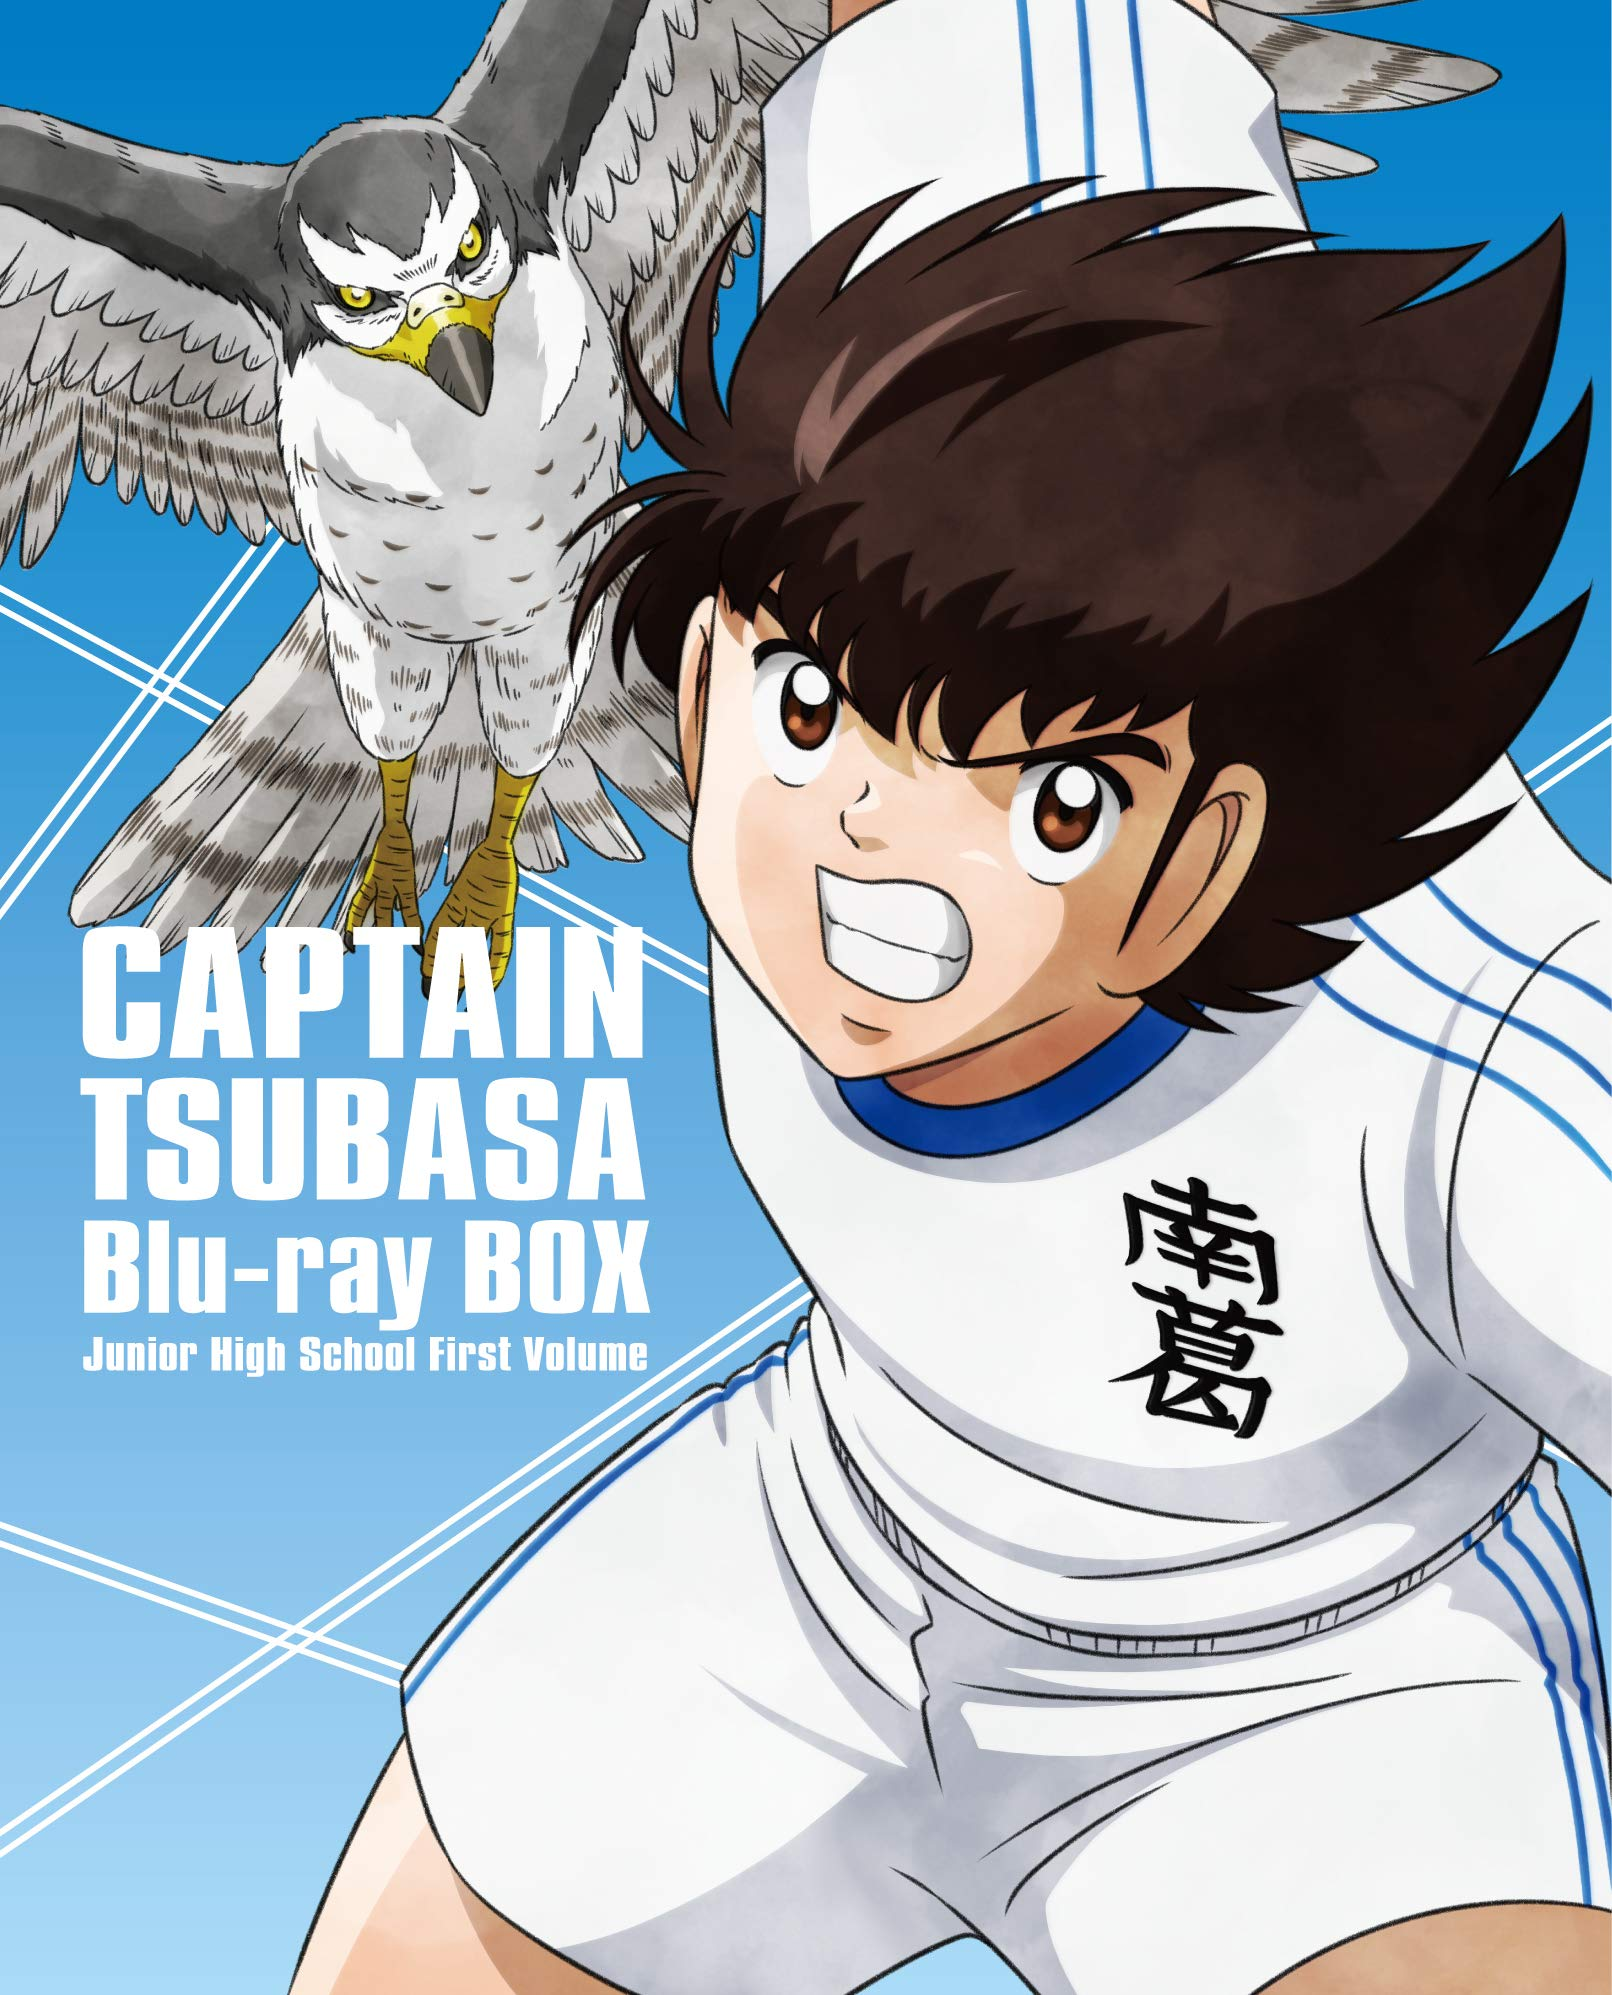 Captain Tsubasa (2018) BD-Boxes & DVD Sets